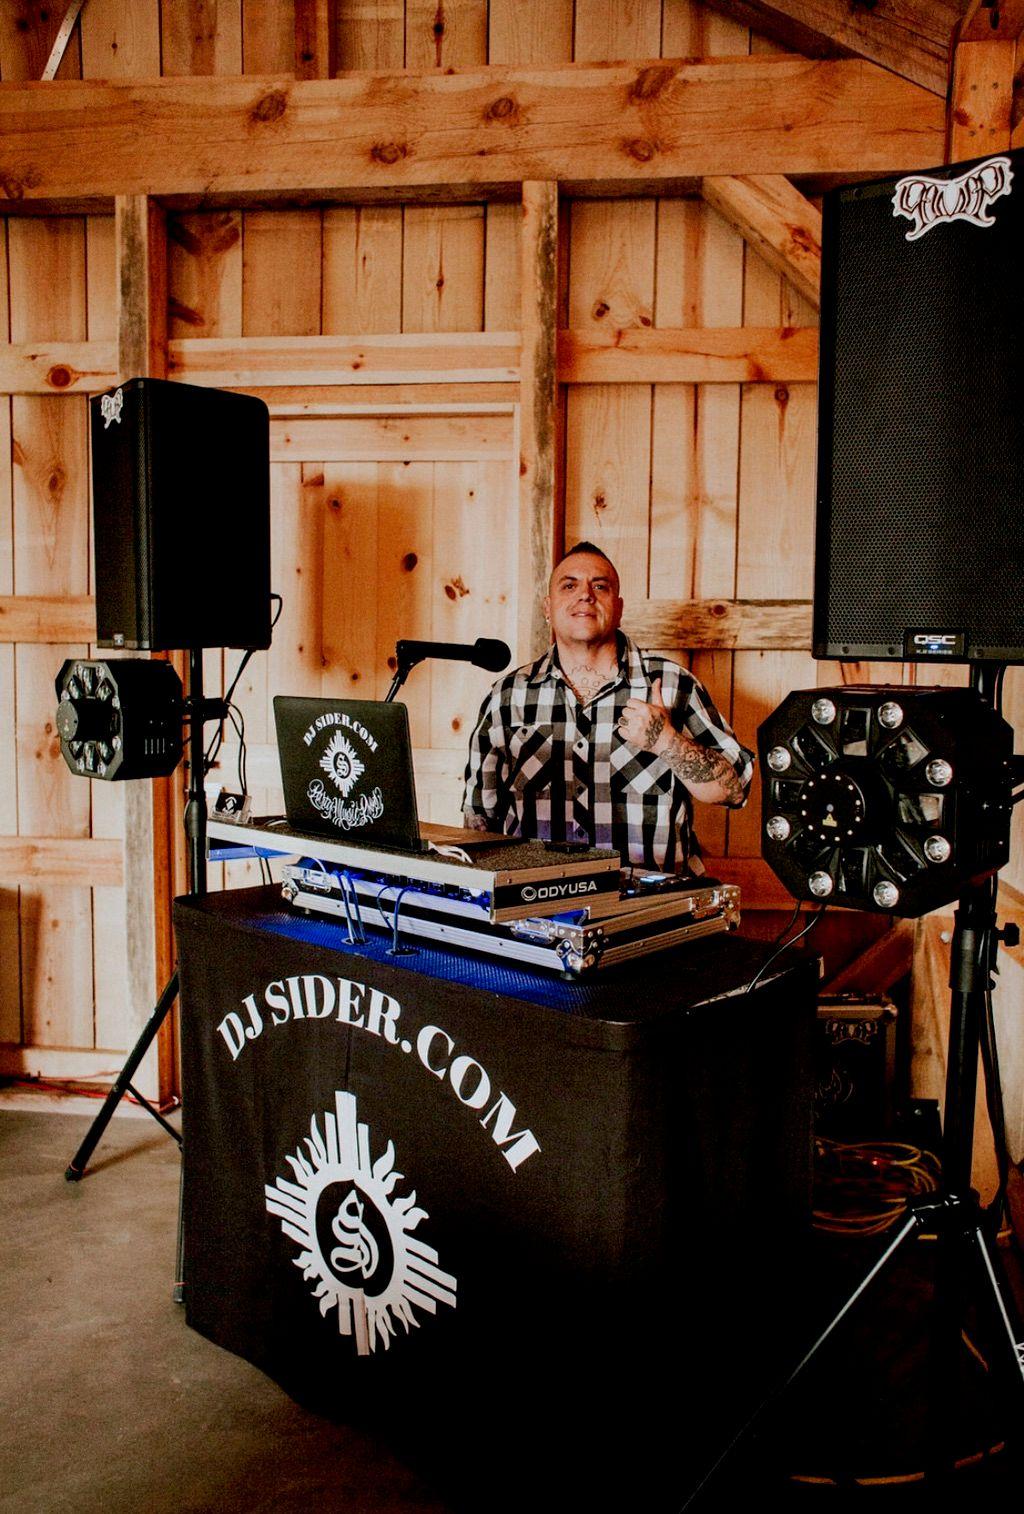 DJ SIDER